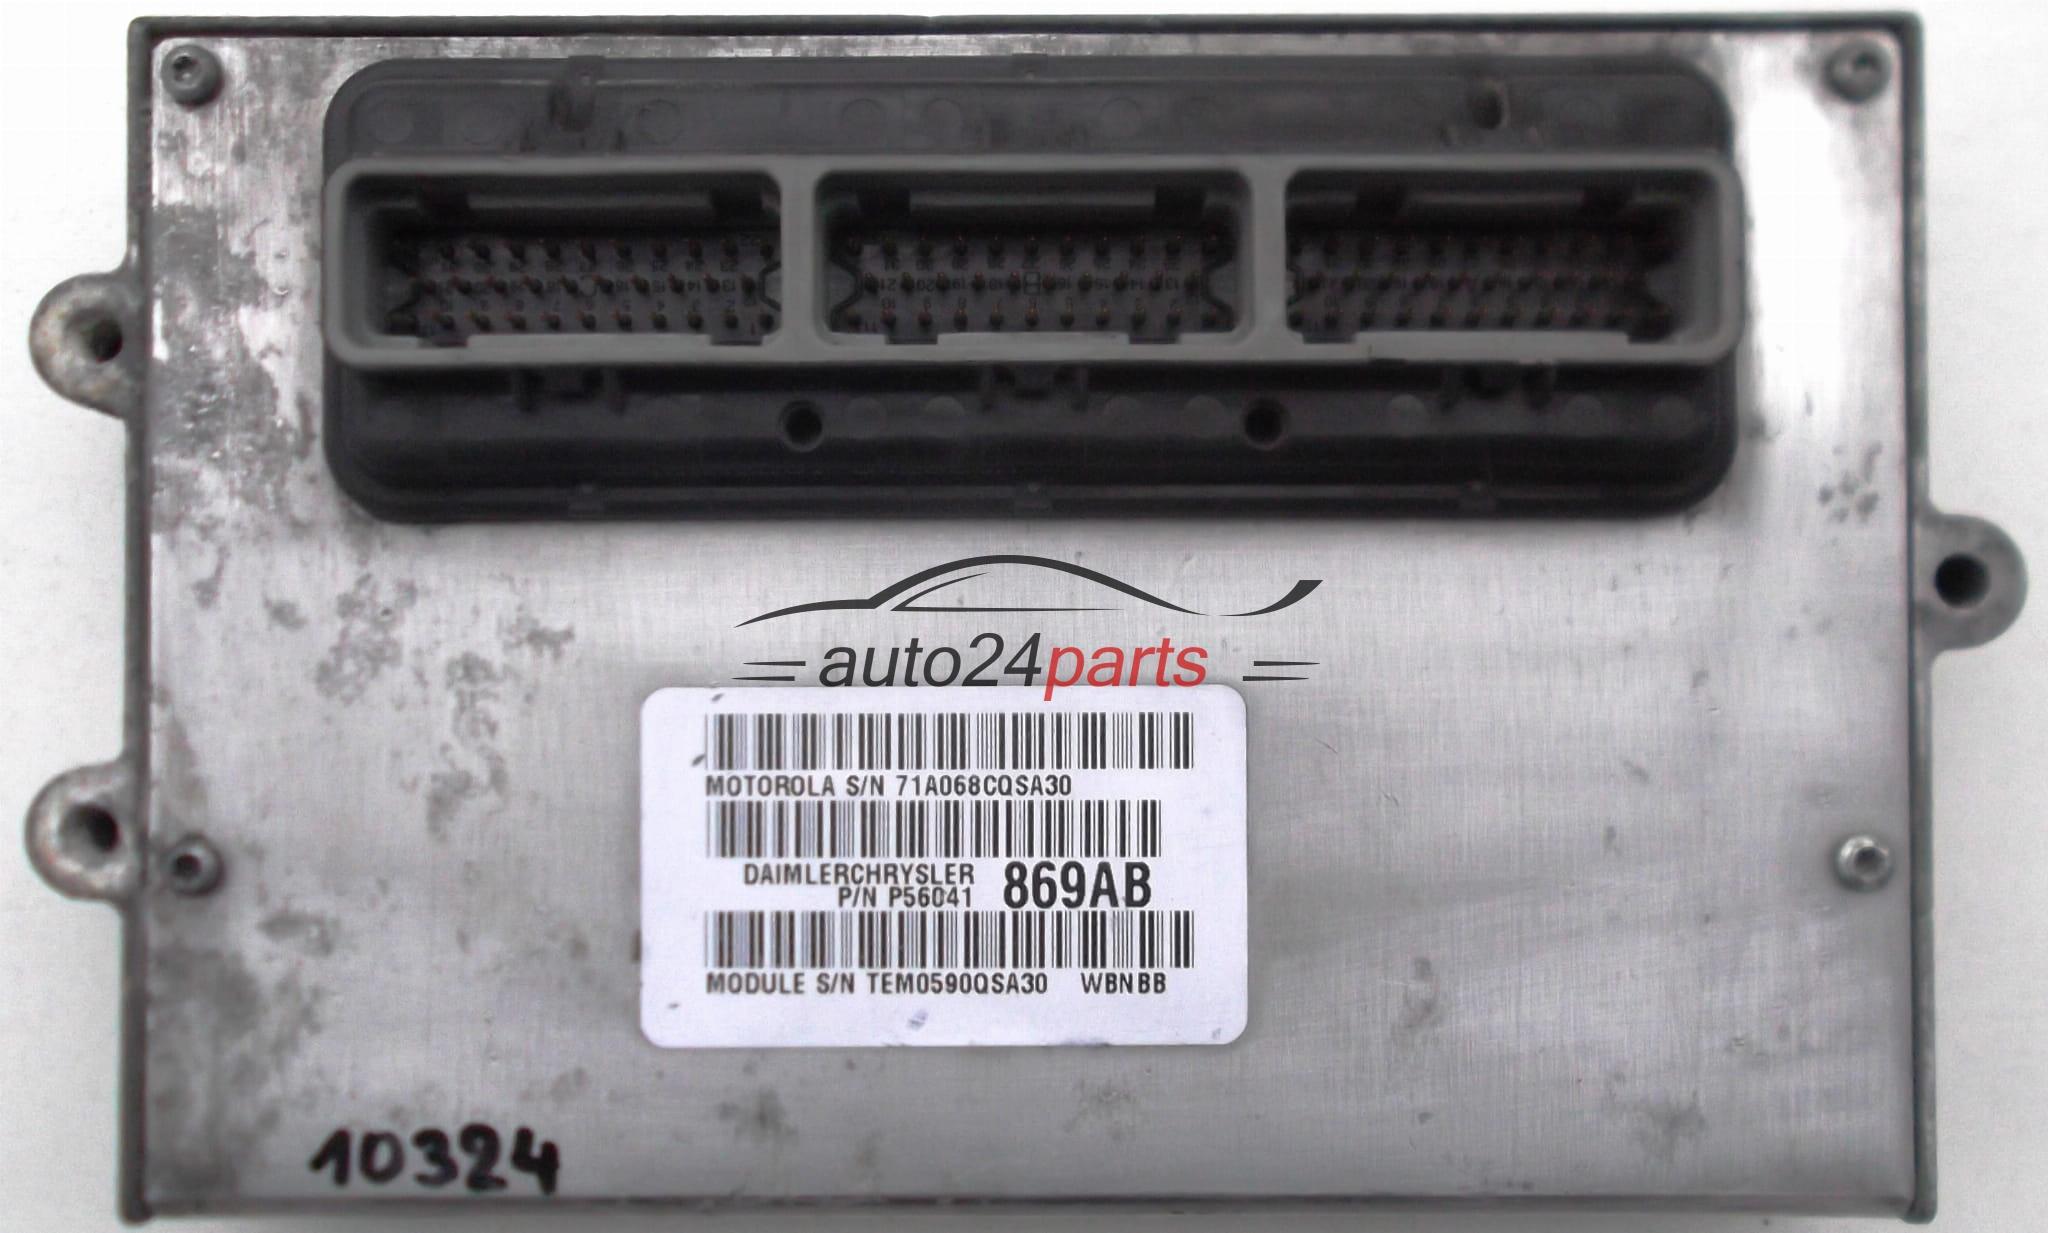 ECU ENGINE CONTROLLER JEEP GRAND CHEROKEE 4.7 V8 MOTOROLA ...